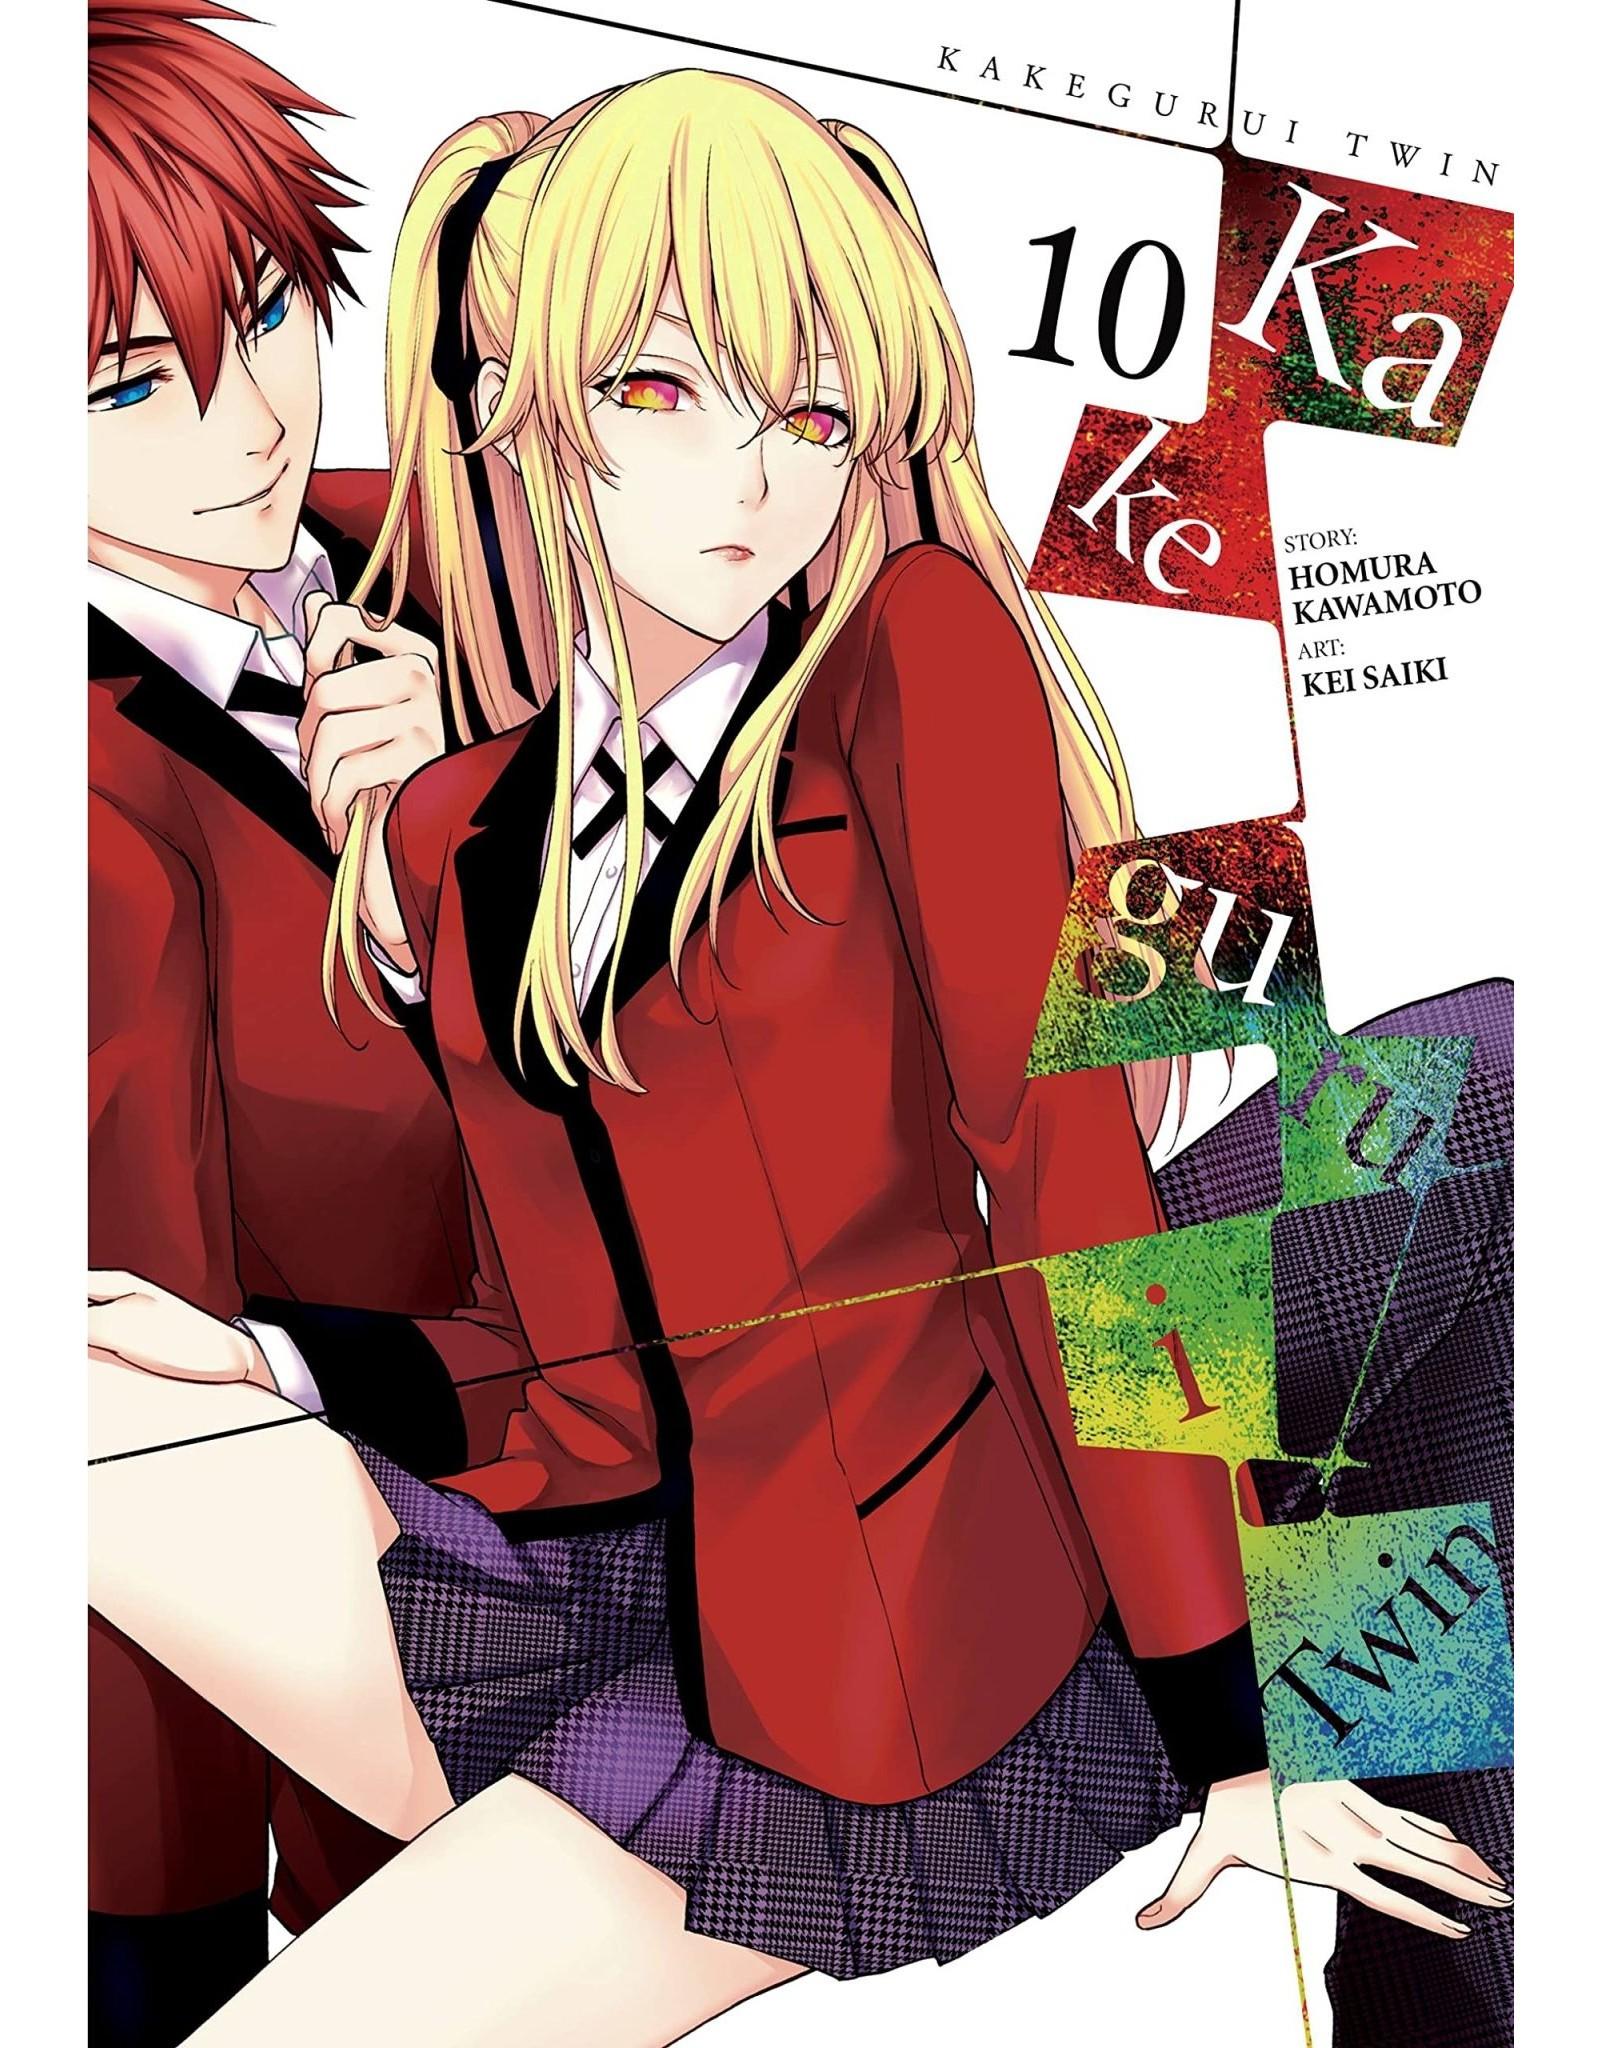 Kakegurui Twin 10 (Engelstalig) - Manga